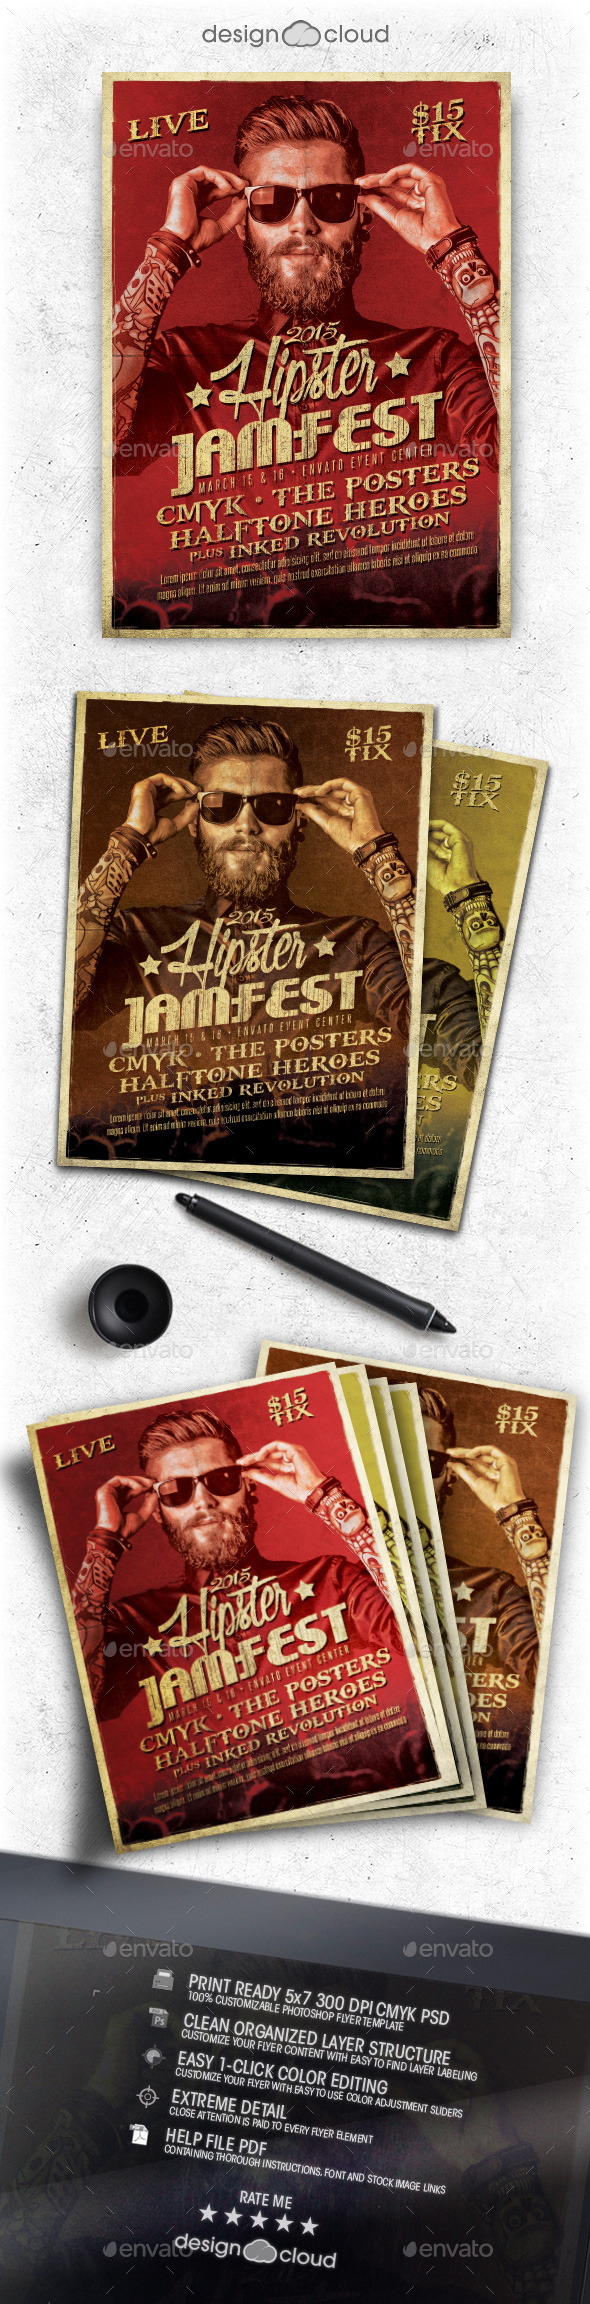 Hipster Jam Fest Flyer/Poster Template - Concerts Events